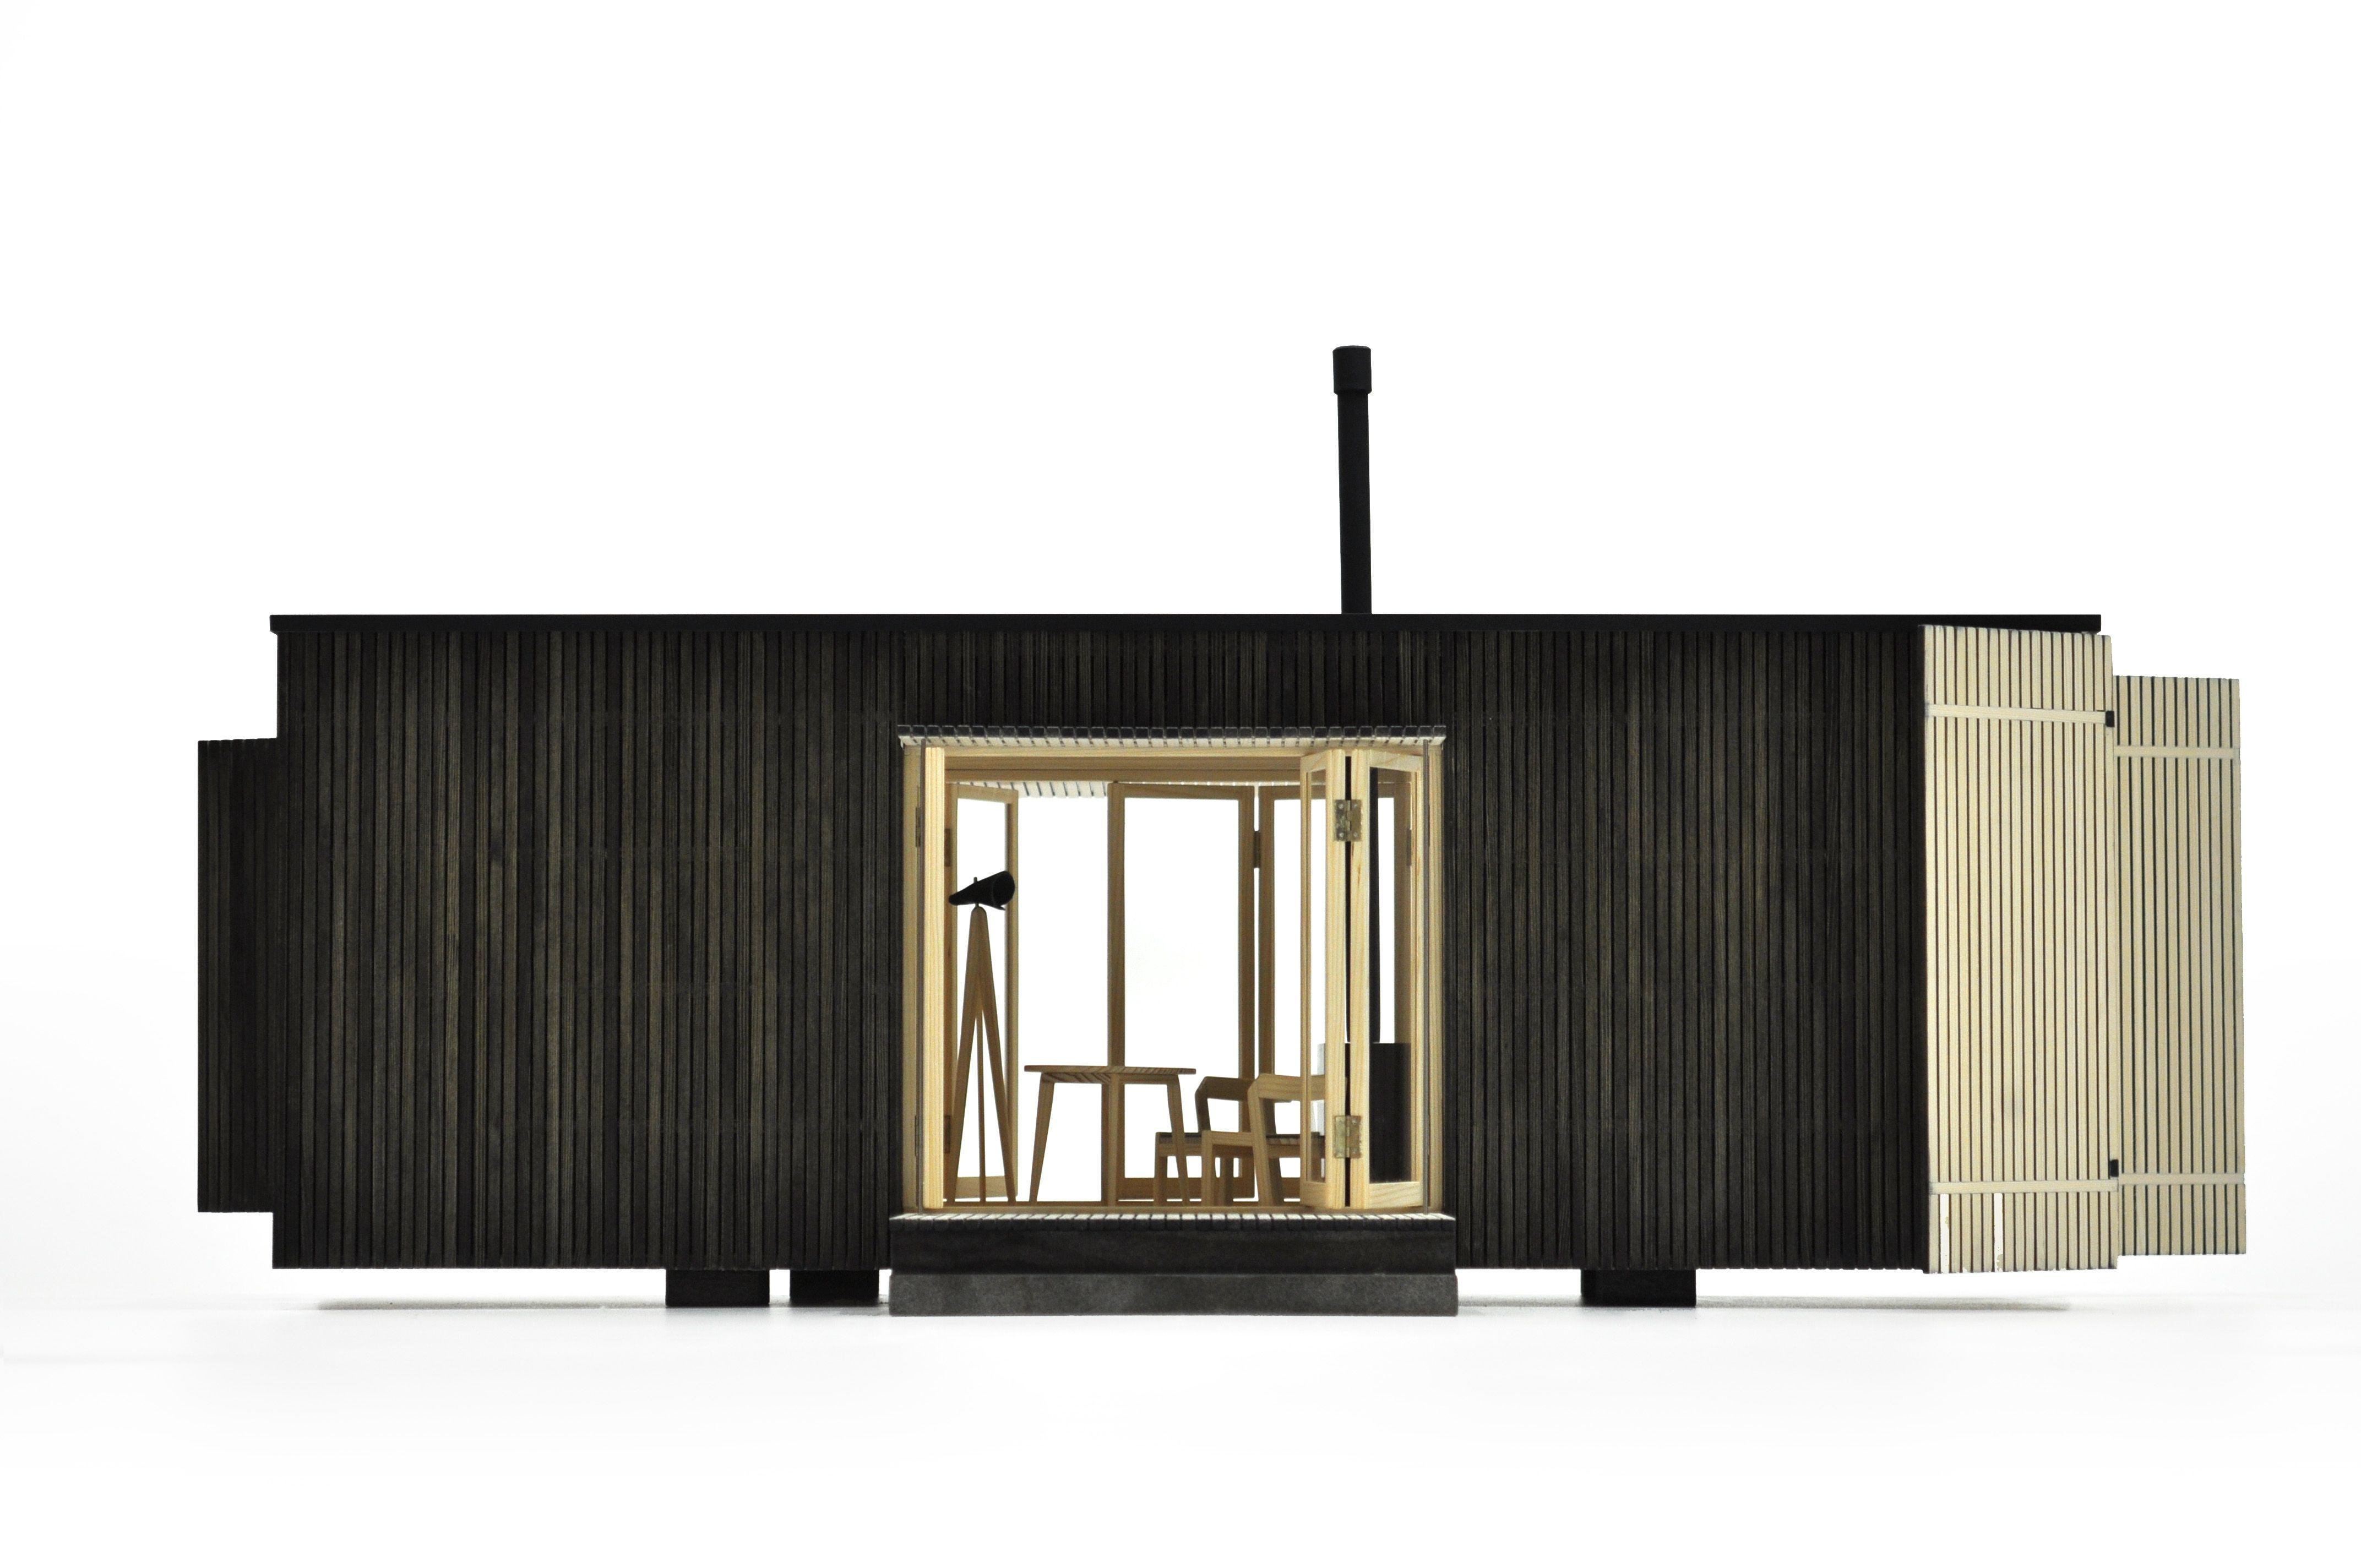 architecture makette, architecture model, cabin, architecture, ark shelter, shelter, visualization, mobile architecture, cottage, container